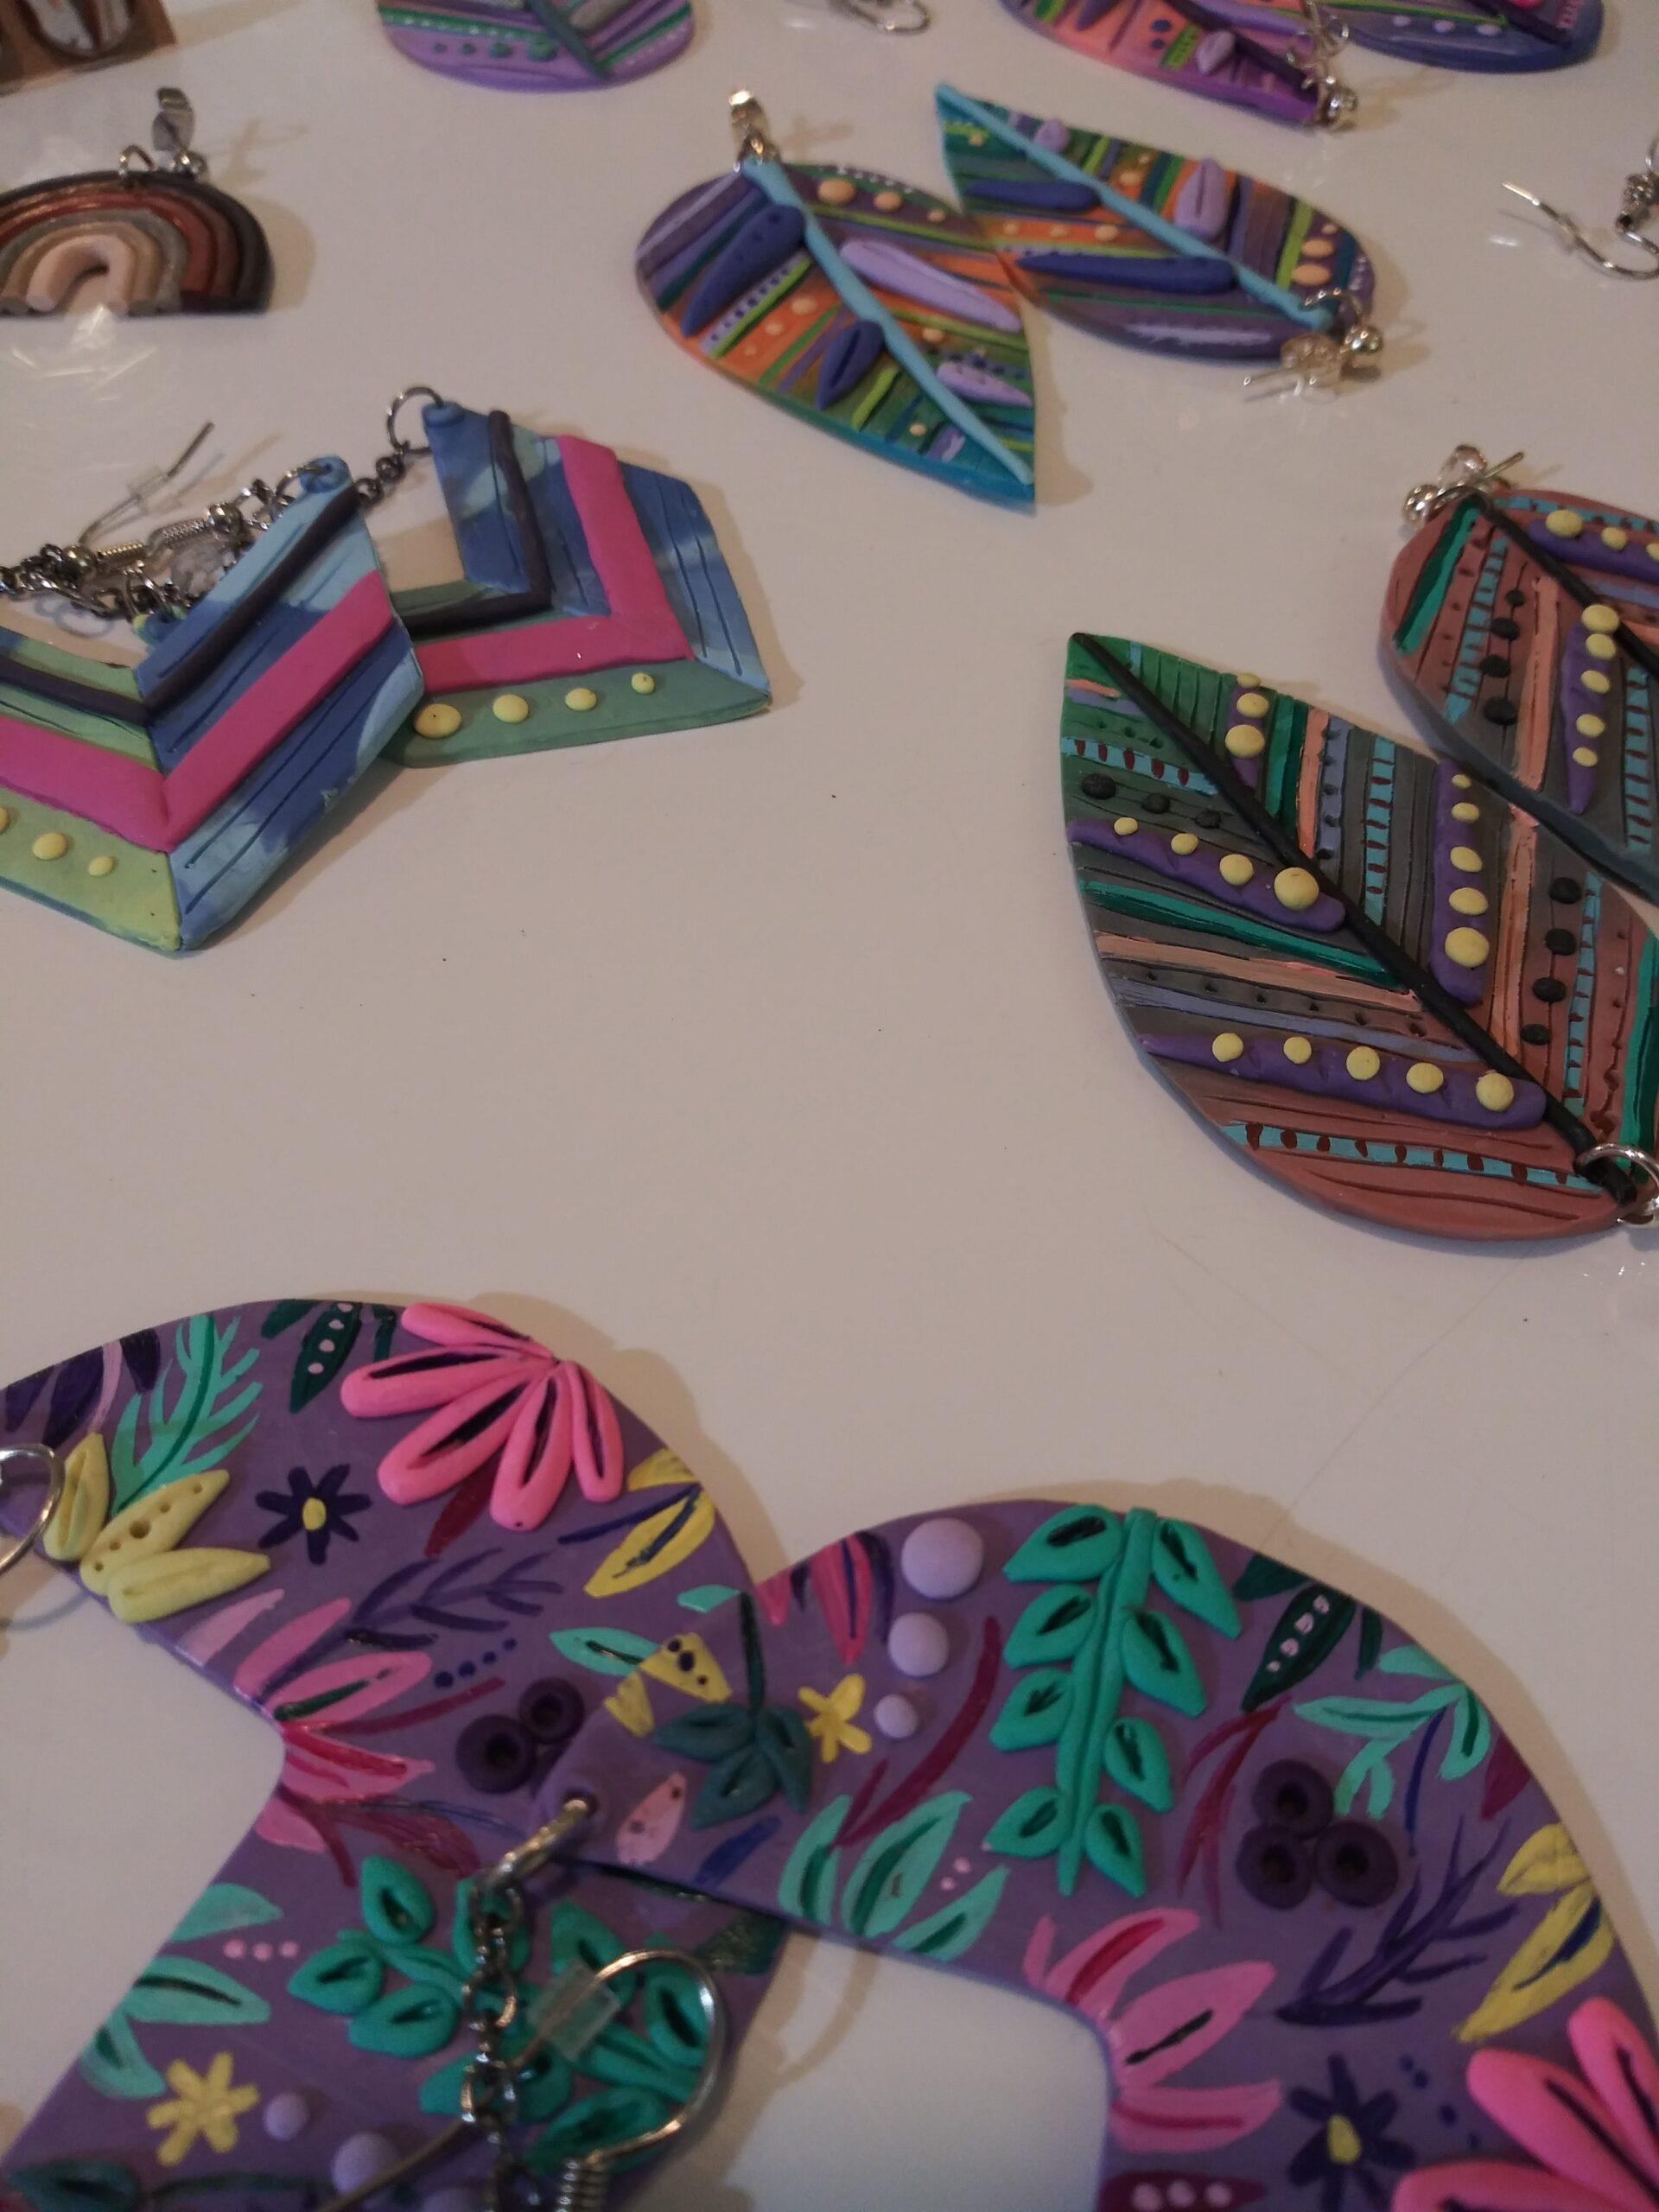 Latest Fad Polymer Clay Jewelry Earrings